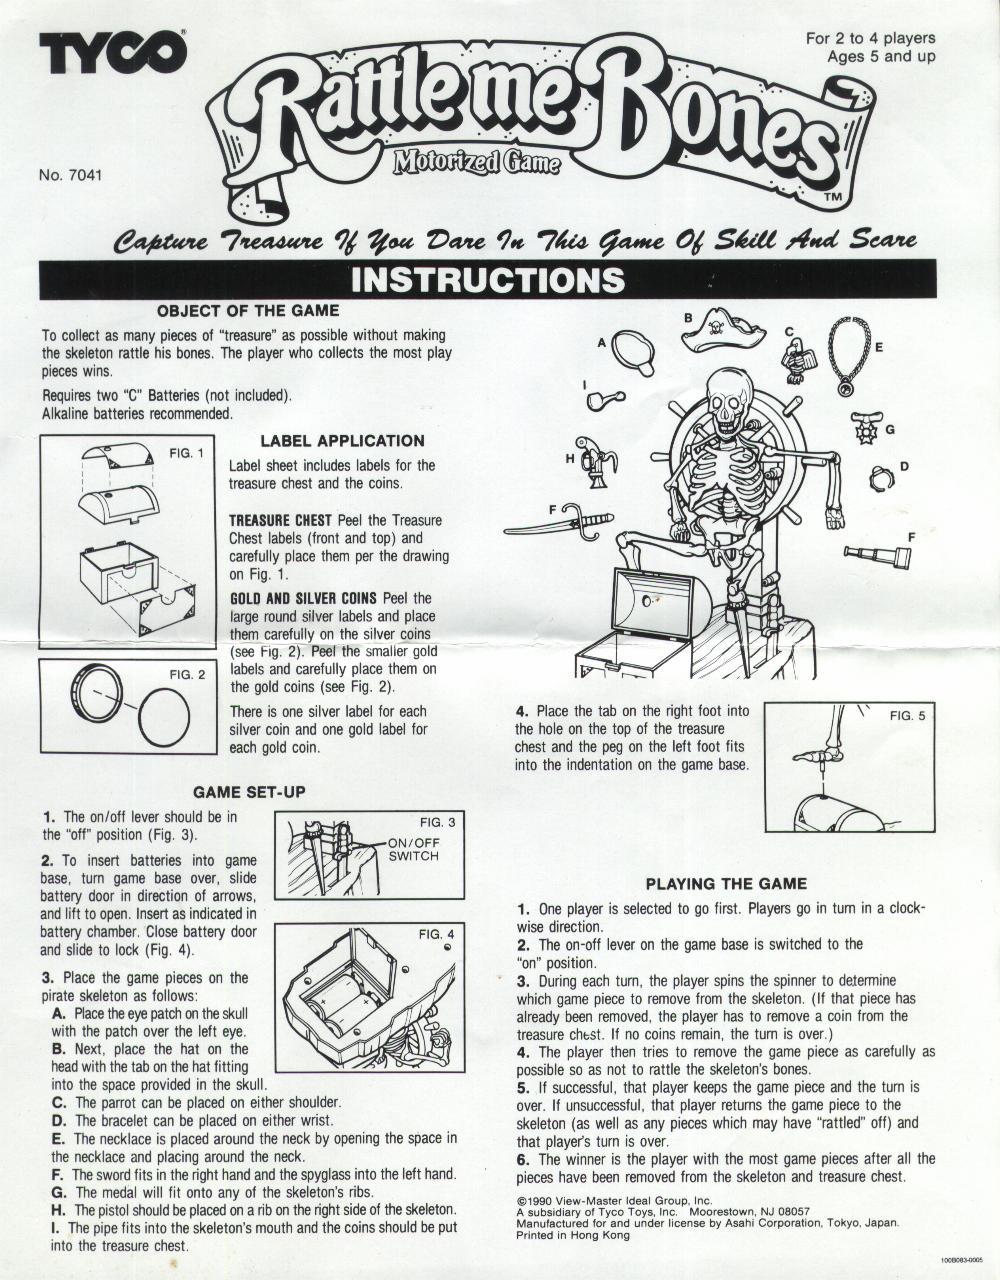 I Spy Snap Game Instructions